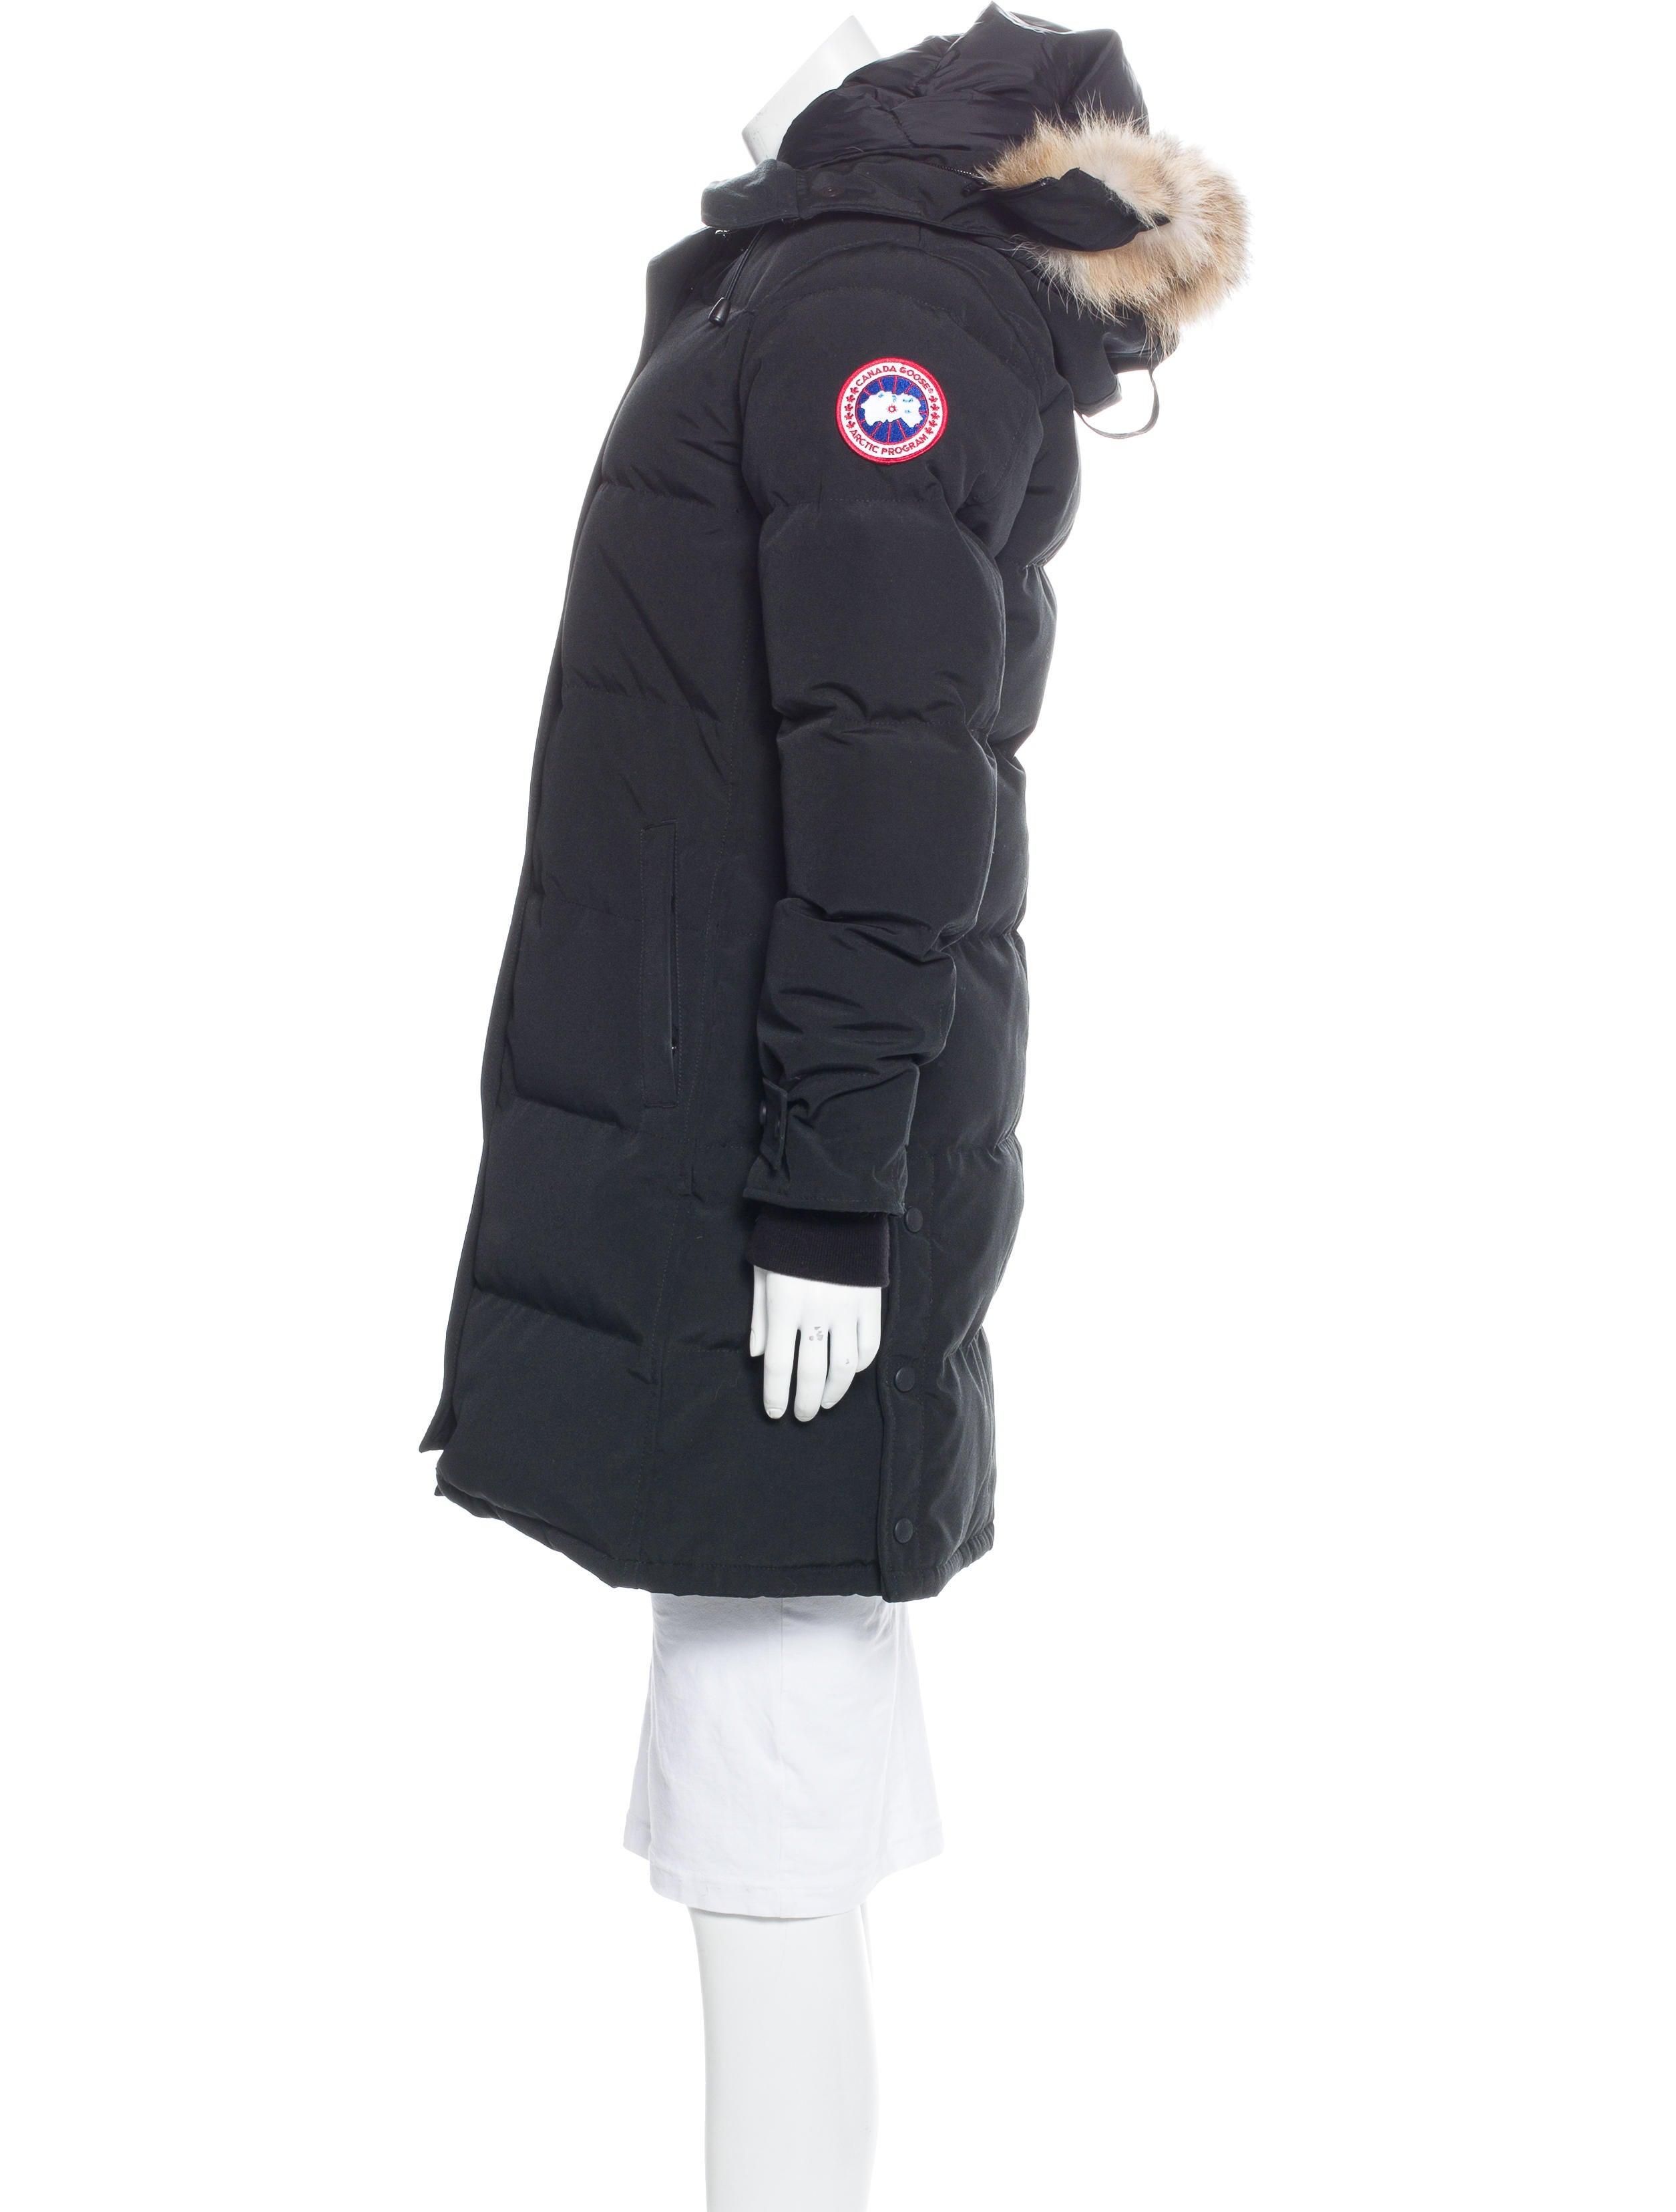 Canada Goose Fur Trimmed Down Coat Clothing Cdo20470